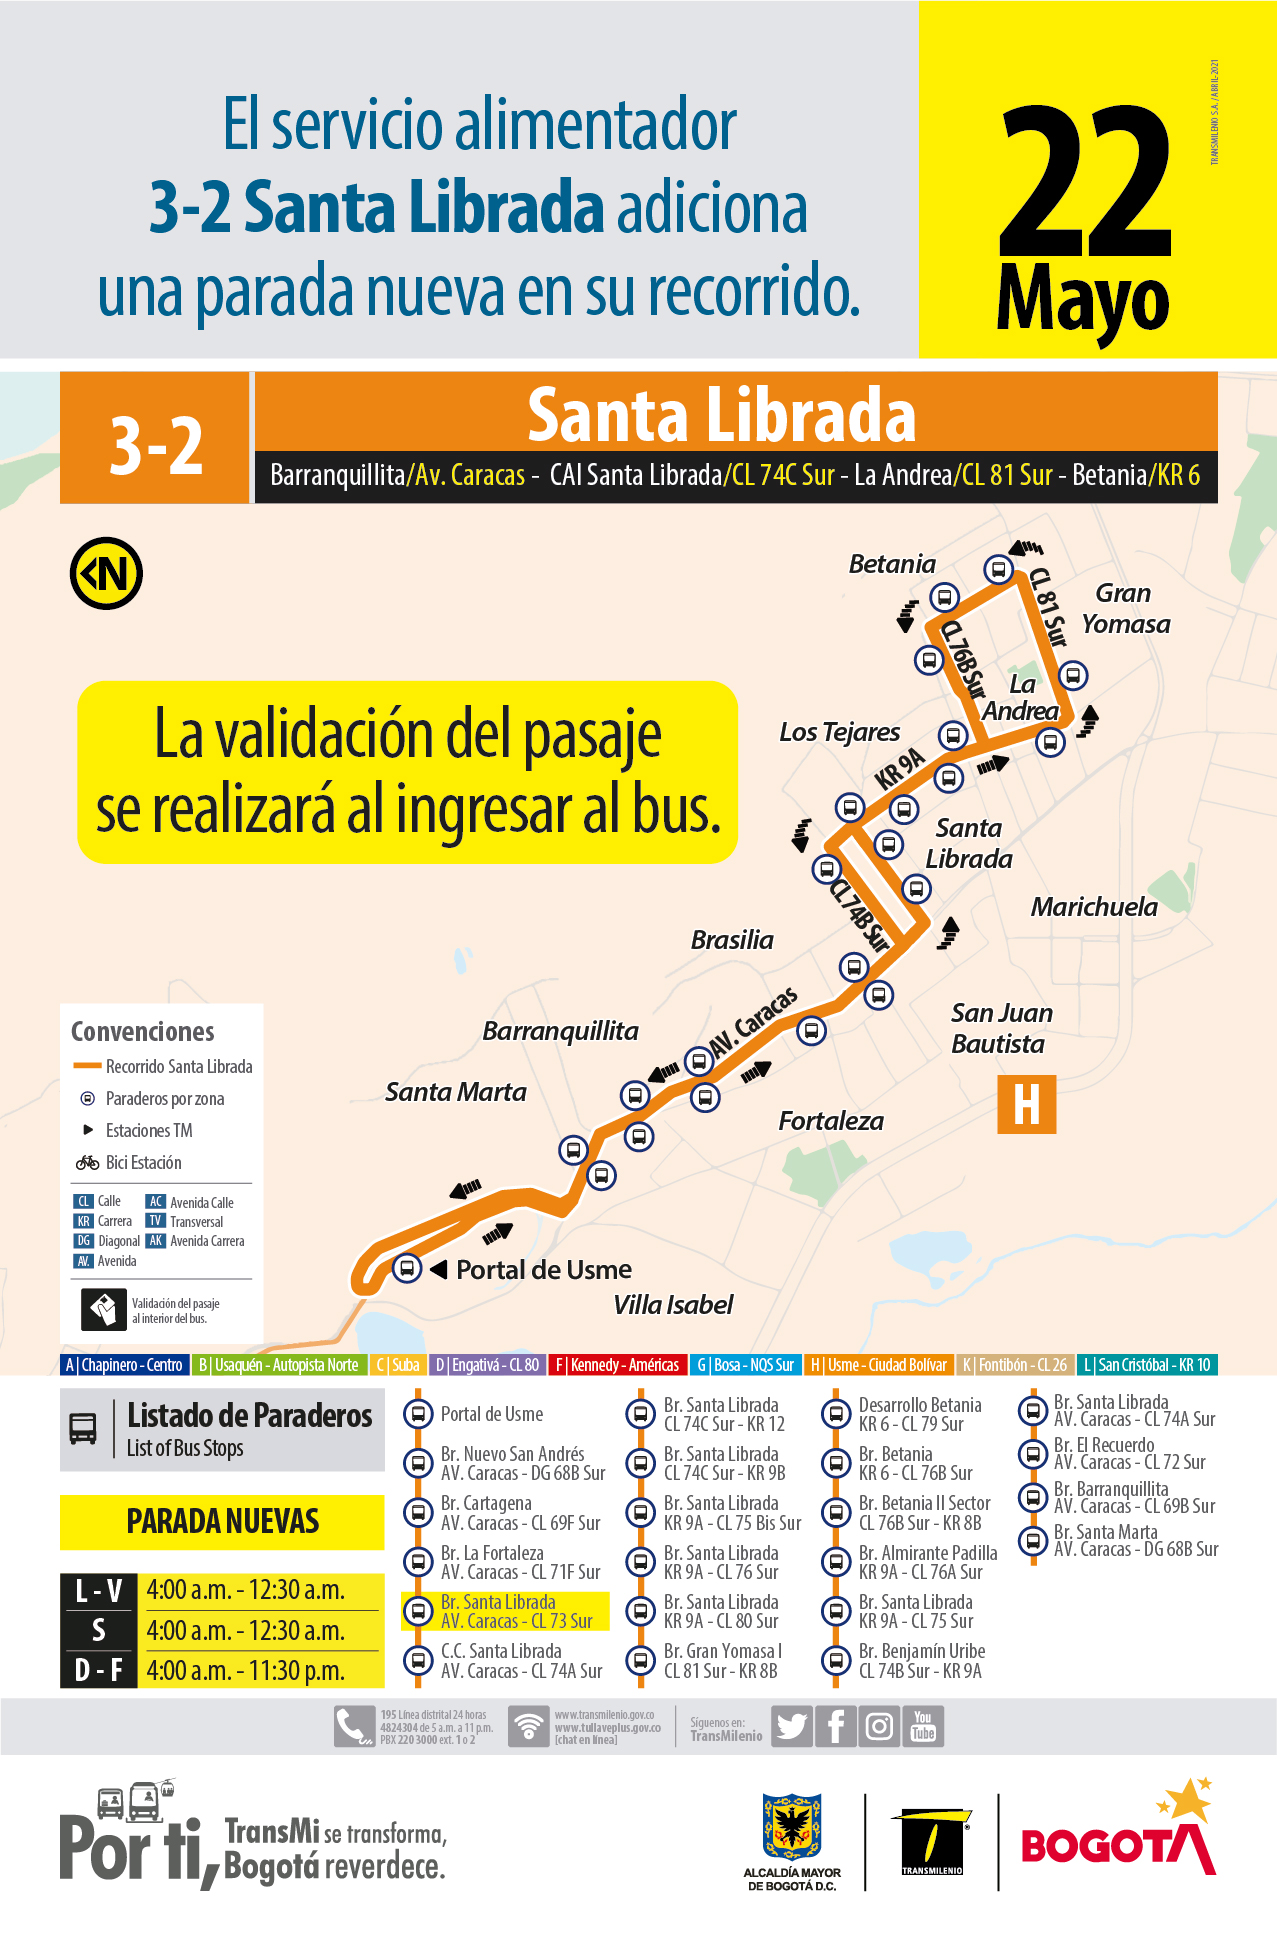 3-2 Santa Librada